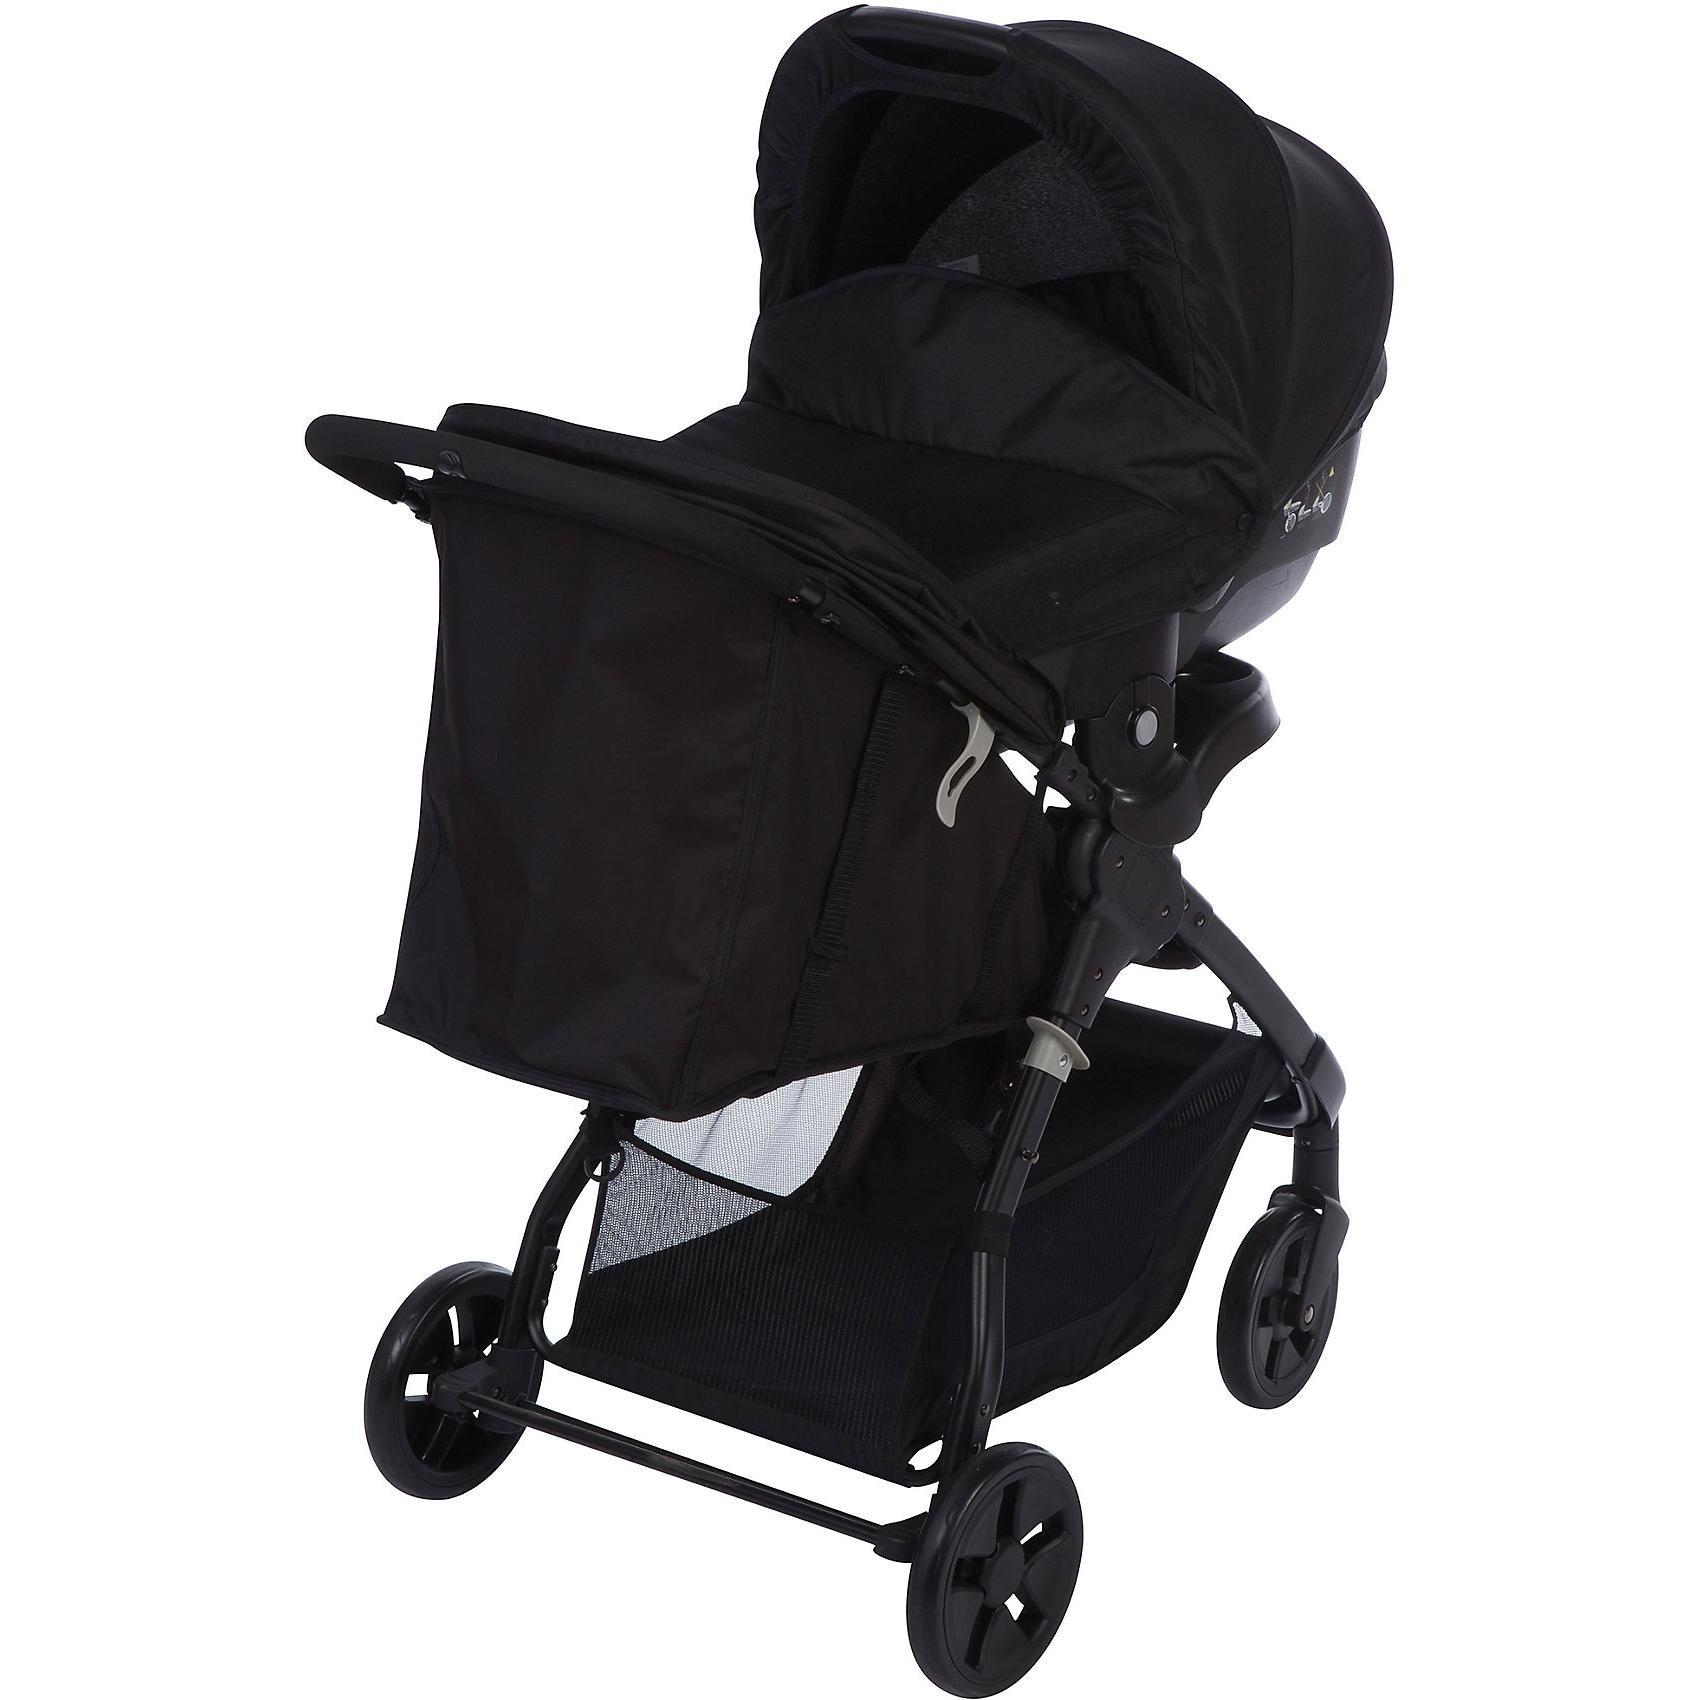 Safety 1st Kombi Kinderwagen Amble 3 in 1 Full Black inkl. Babyschale 2018